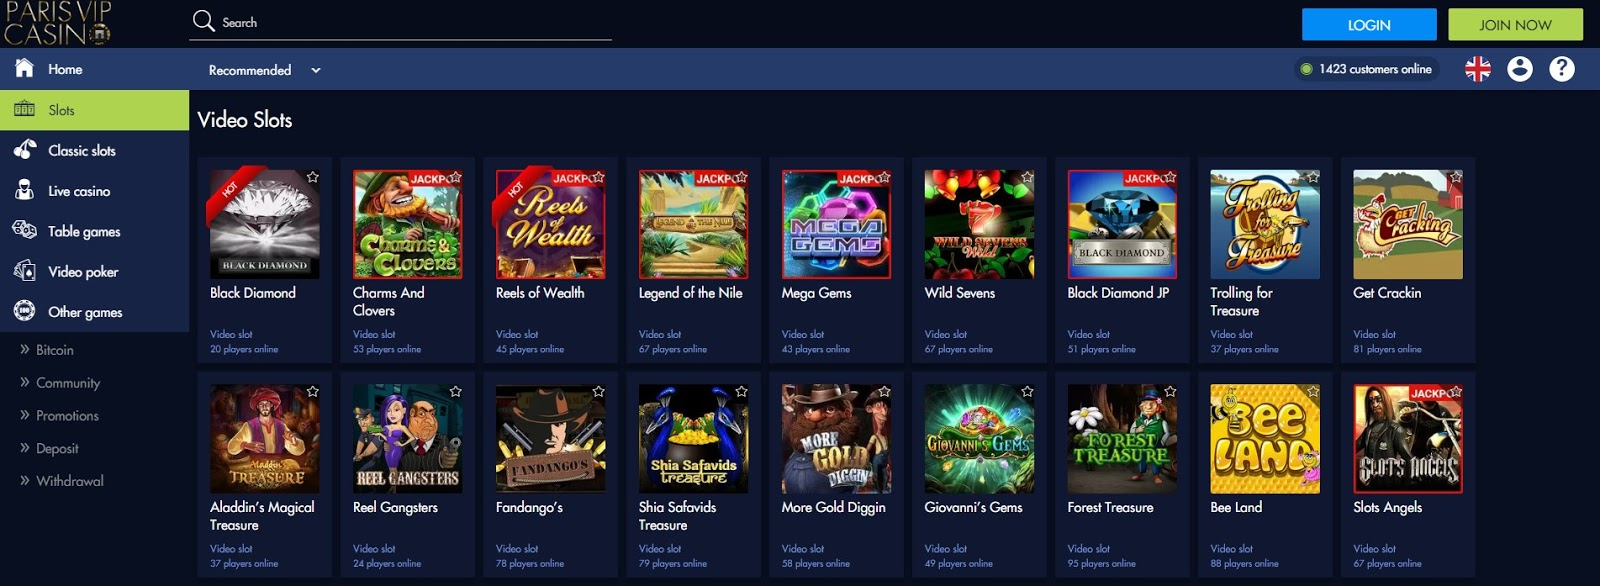 Videoslots Kontakt Betfred Playtech Casino -551650